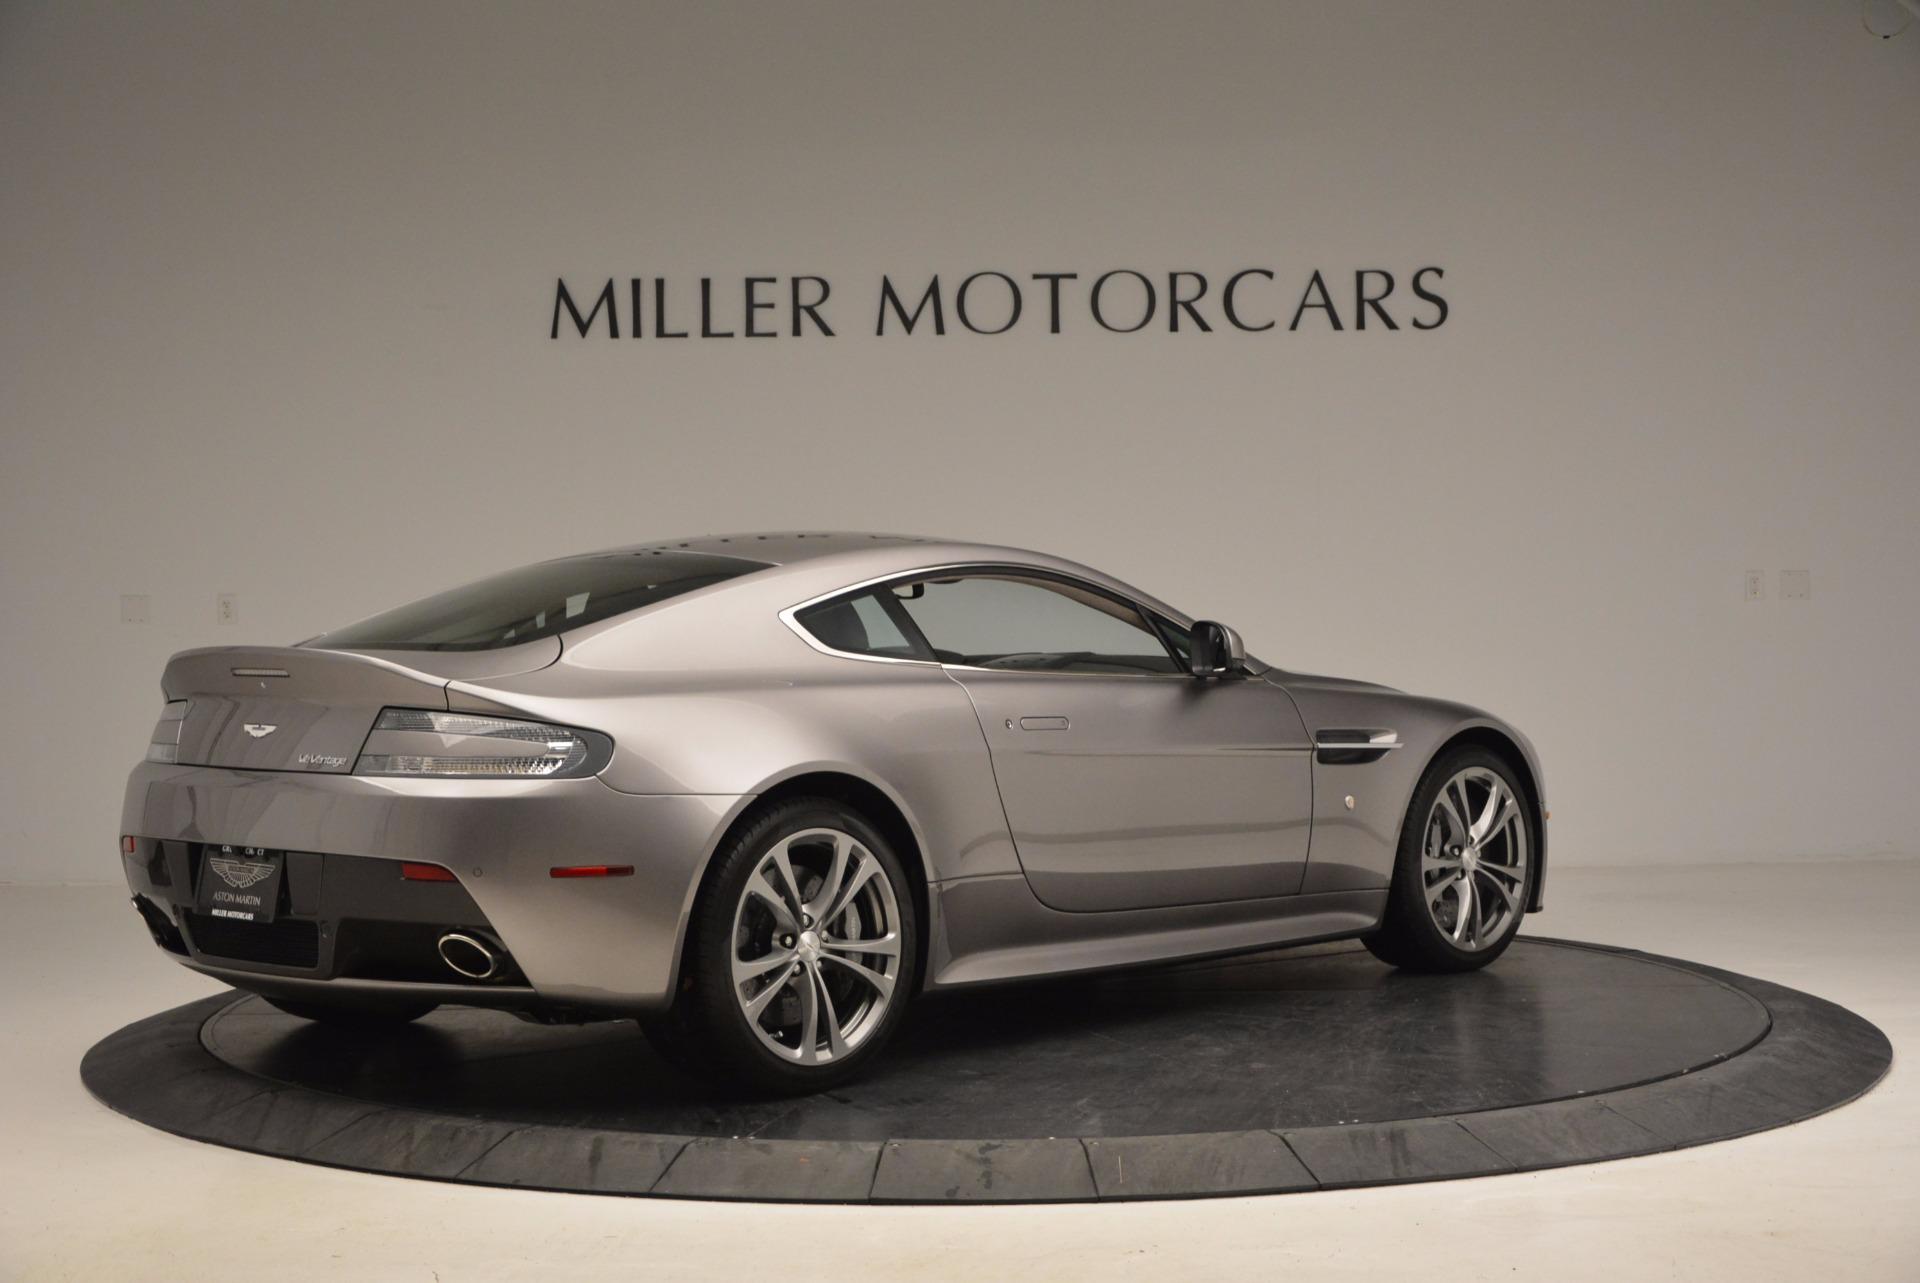 Used 2012 Aston Martin V12 Vantage  For Sale In Greenwich, CT 994_p8